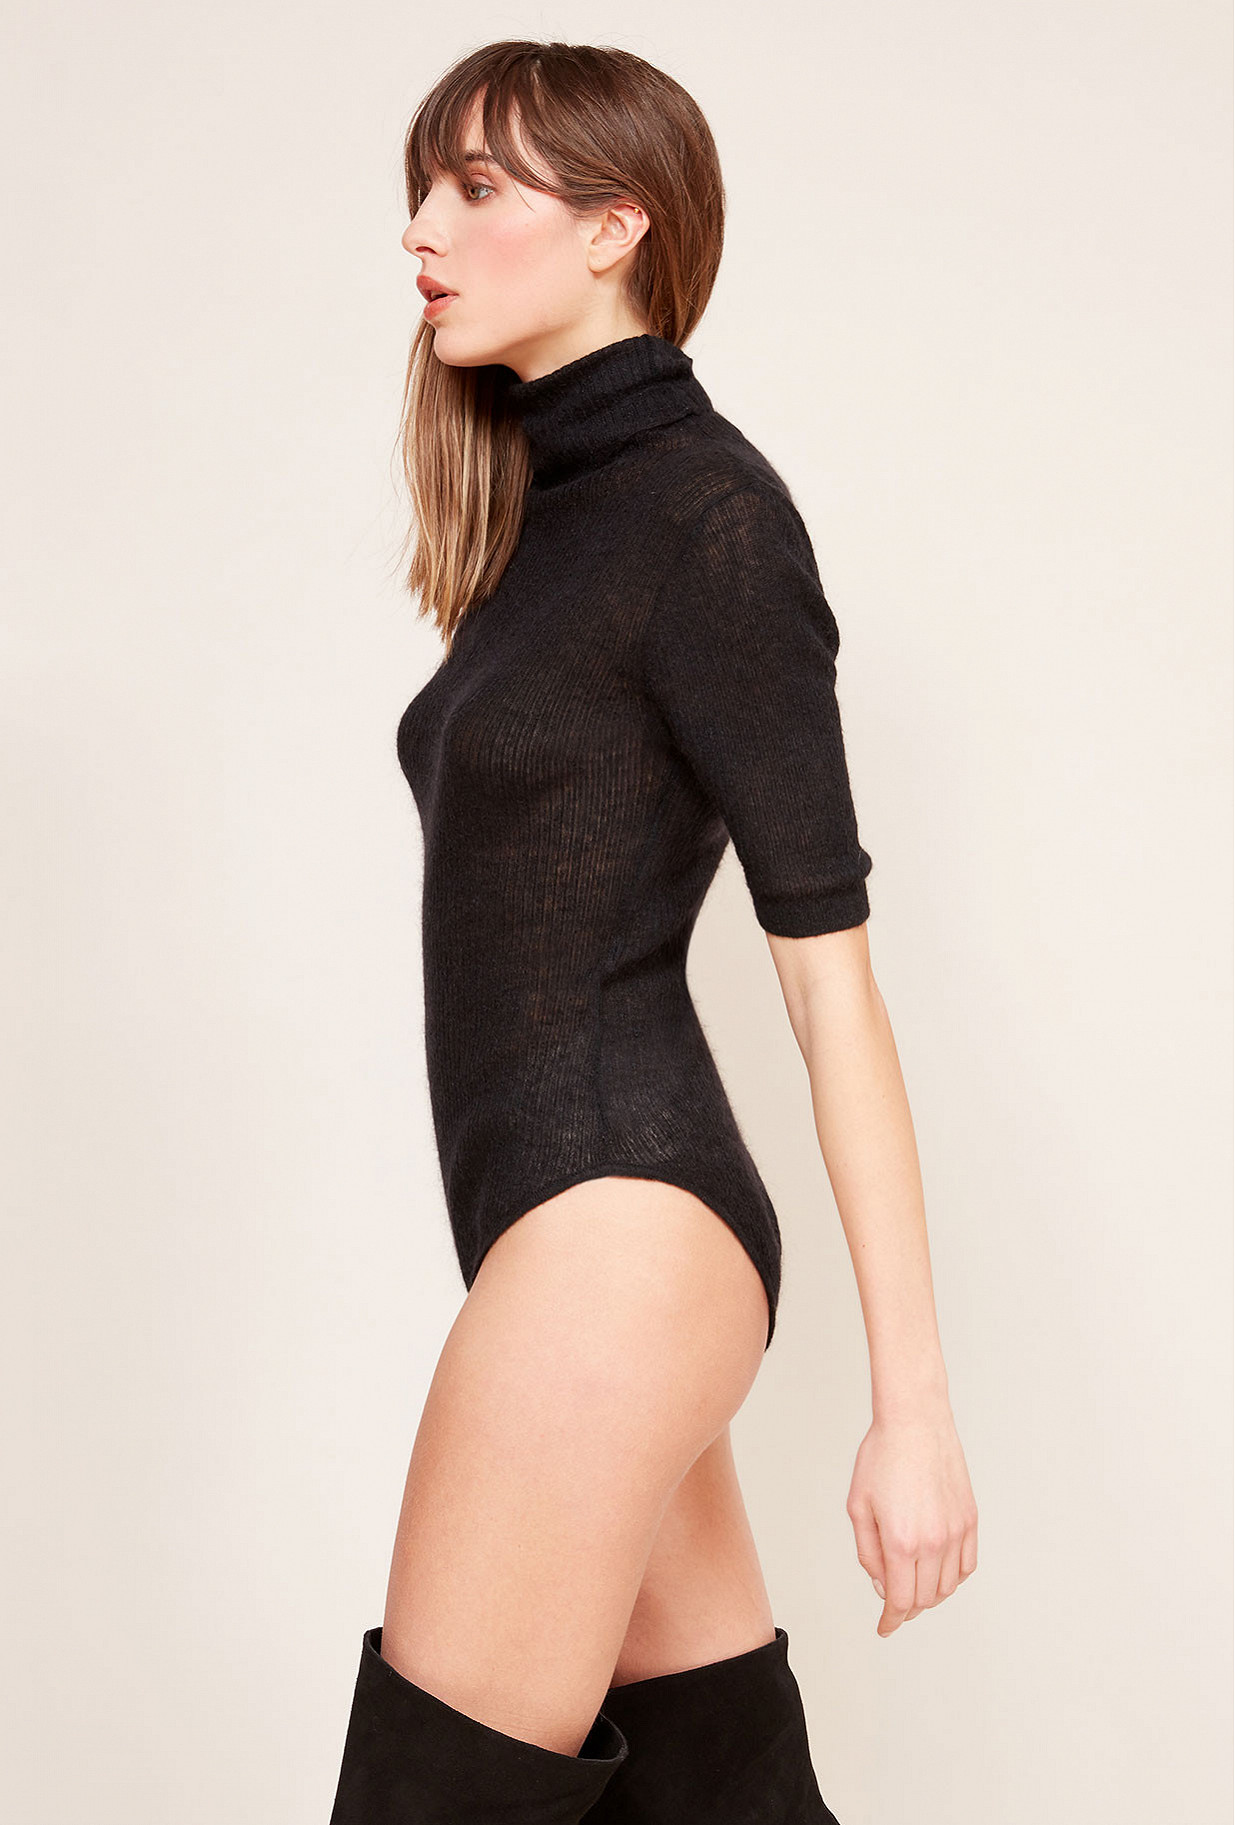 Paris clothes store Body  Shakira french designer fashion Paris